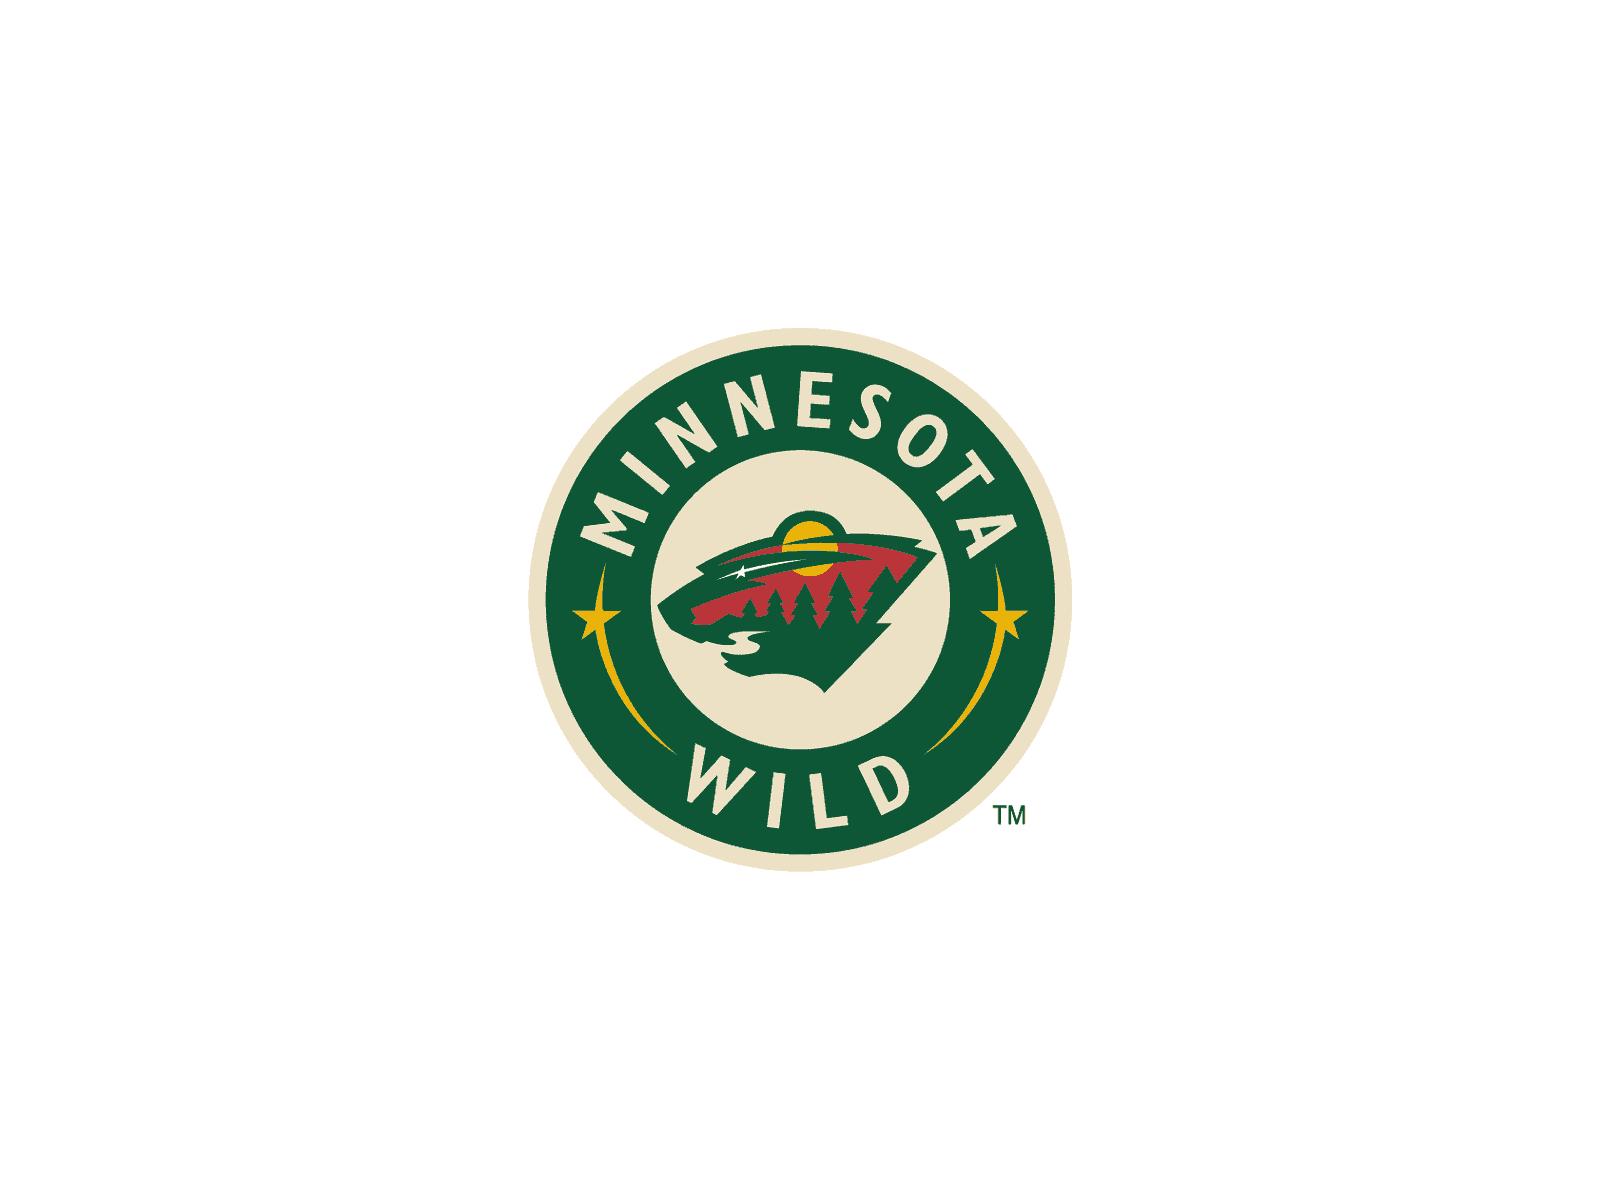 Minnesota wild hd wallpapers wallpapersafari - Minnesota wild logo ...